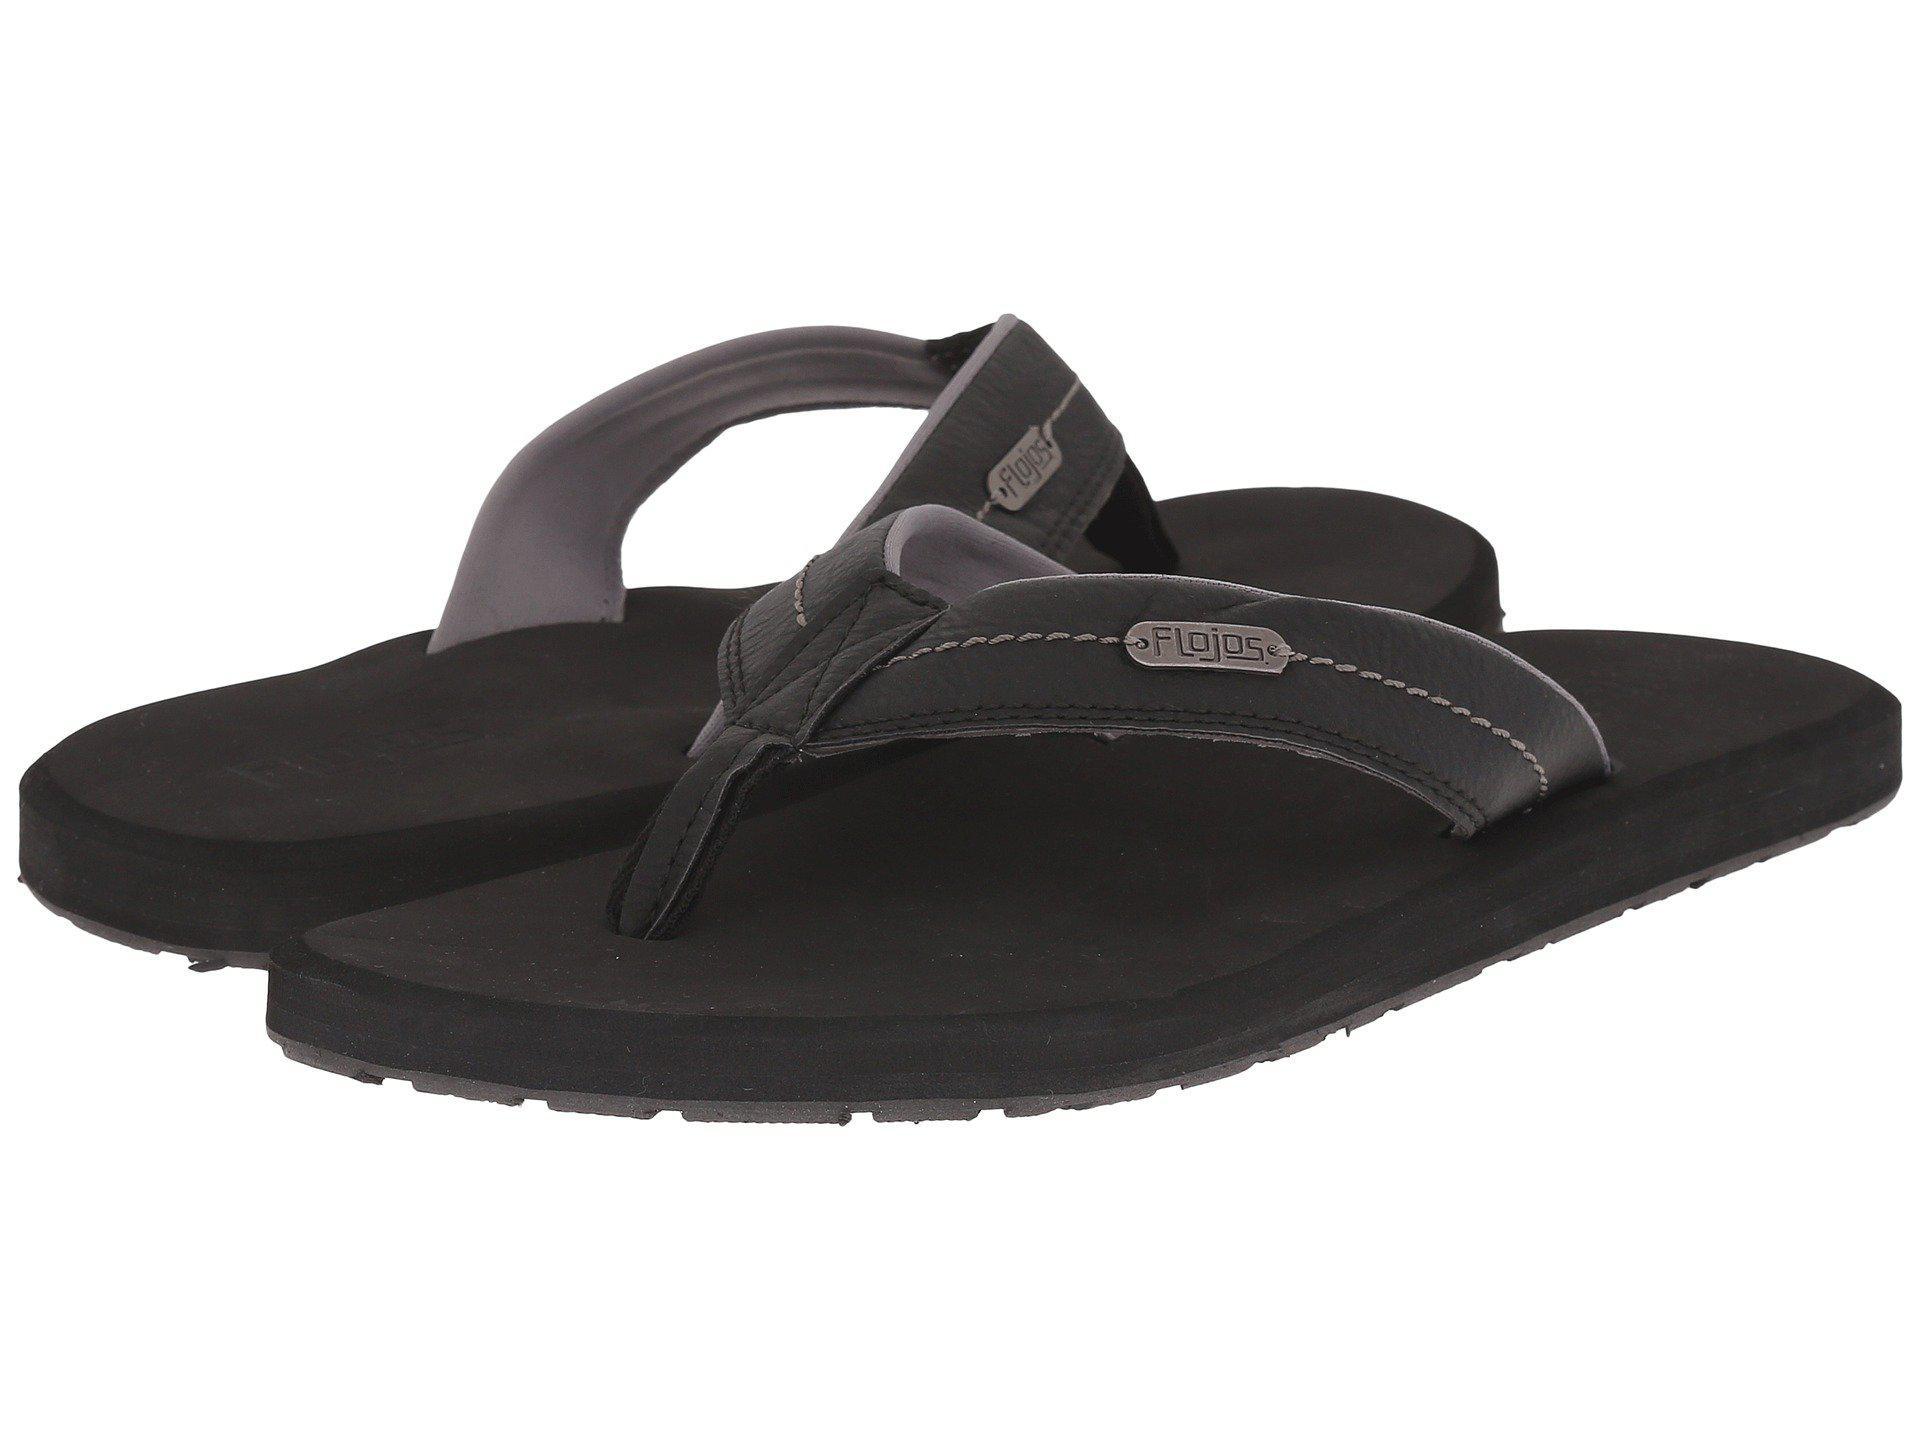 58e4aa6d94c9 Lyst - Flojos Zane (brown) Men s Sandals in Black for Men - Save 37%